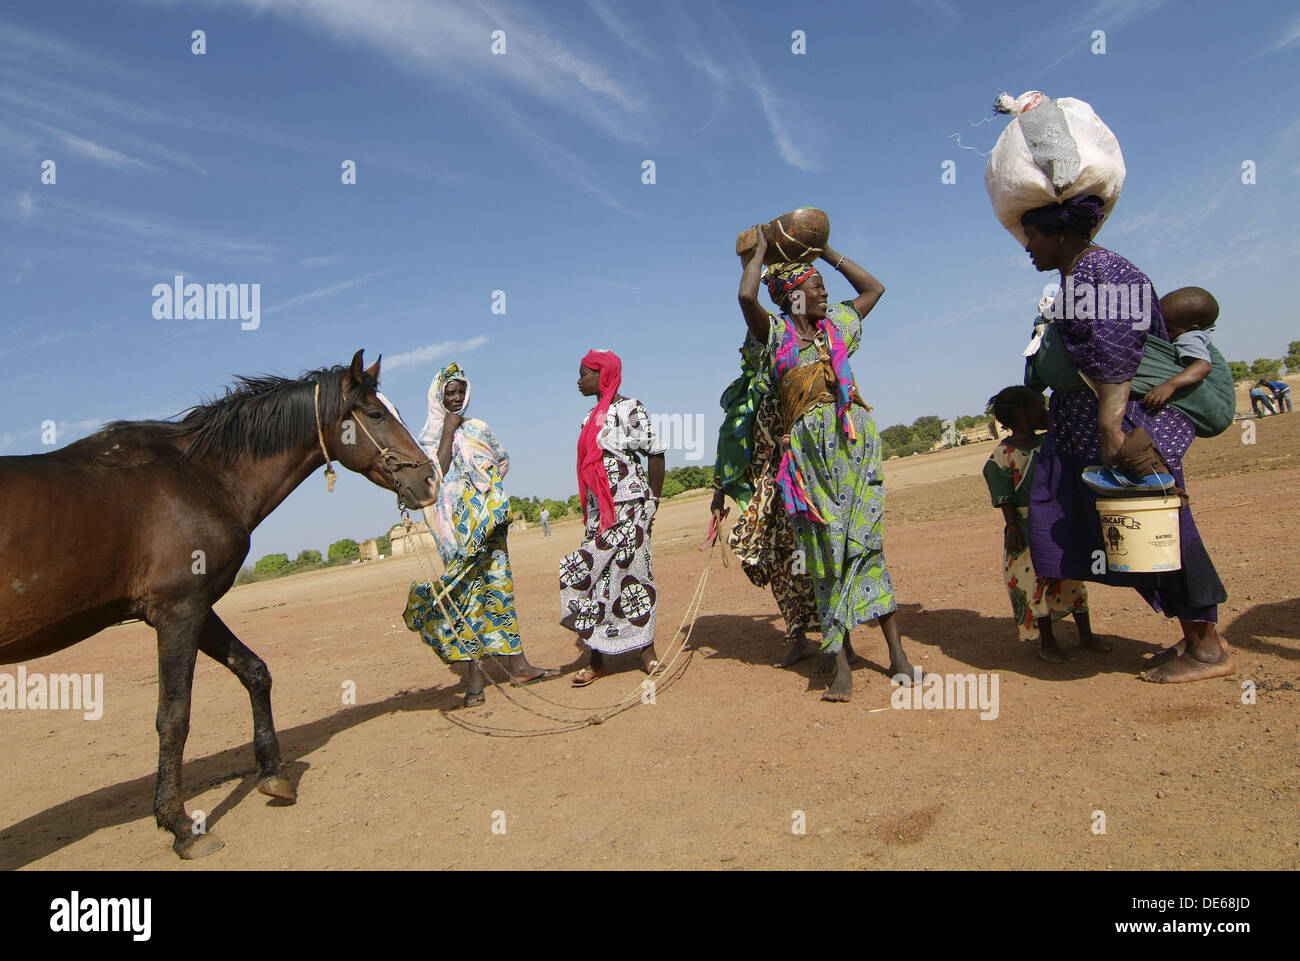 People waiting the ferryboat, Djenne, Mali Stock Photo